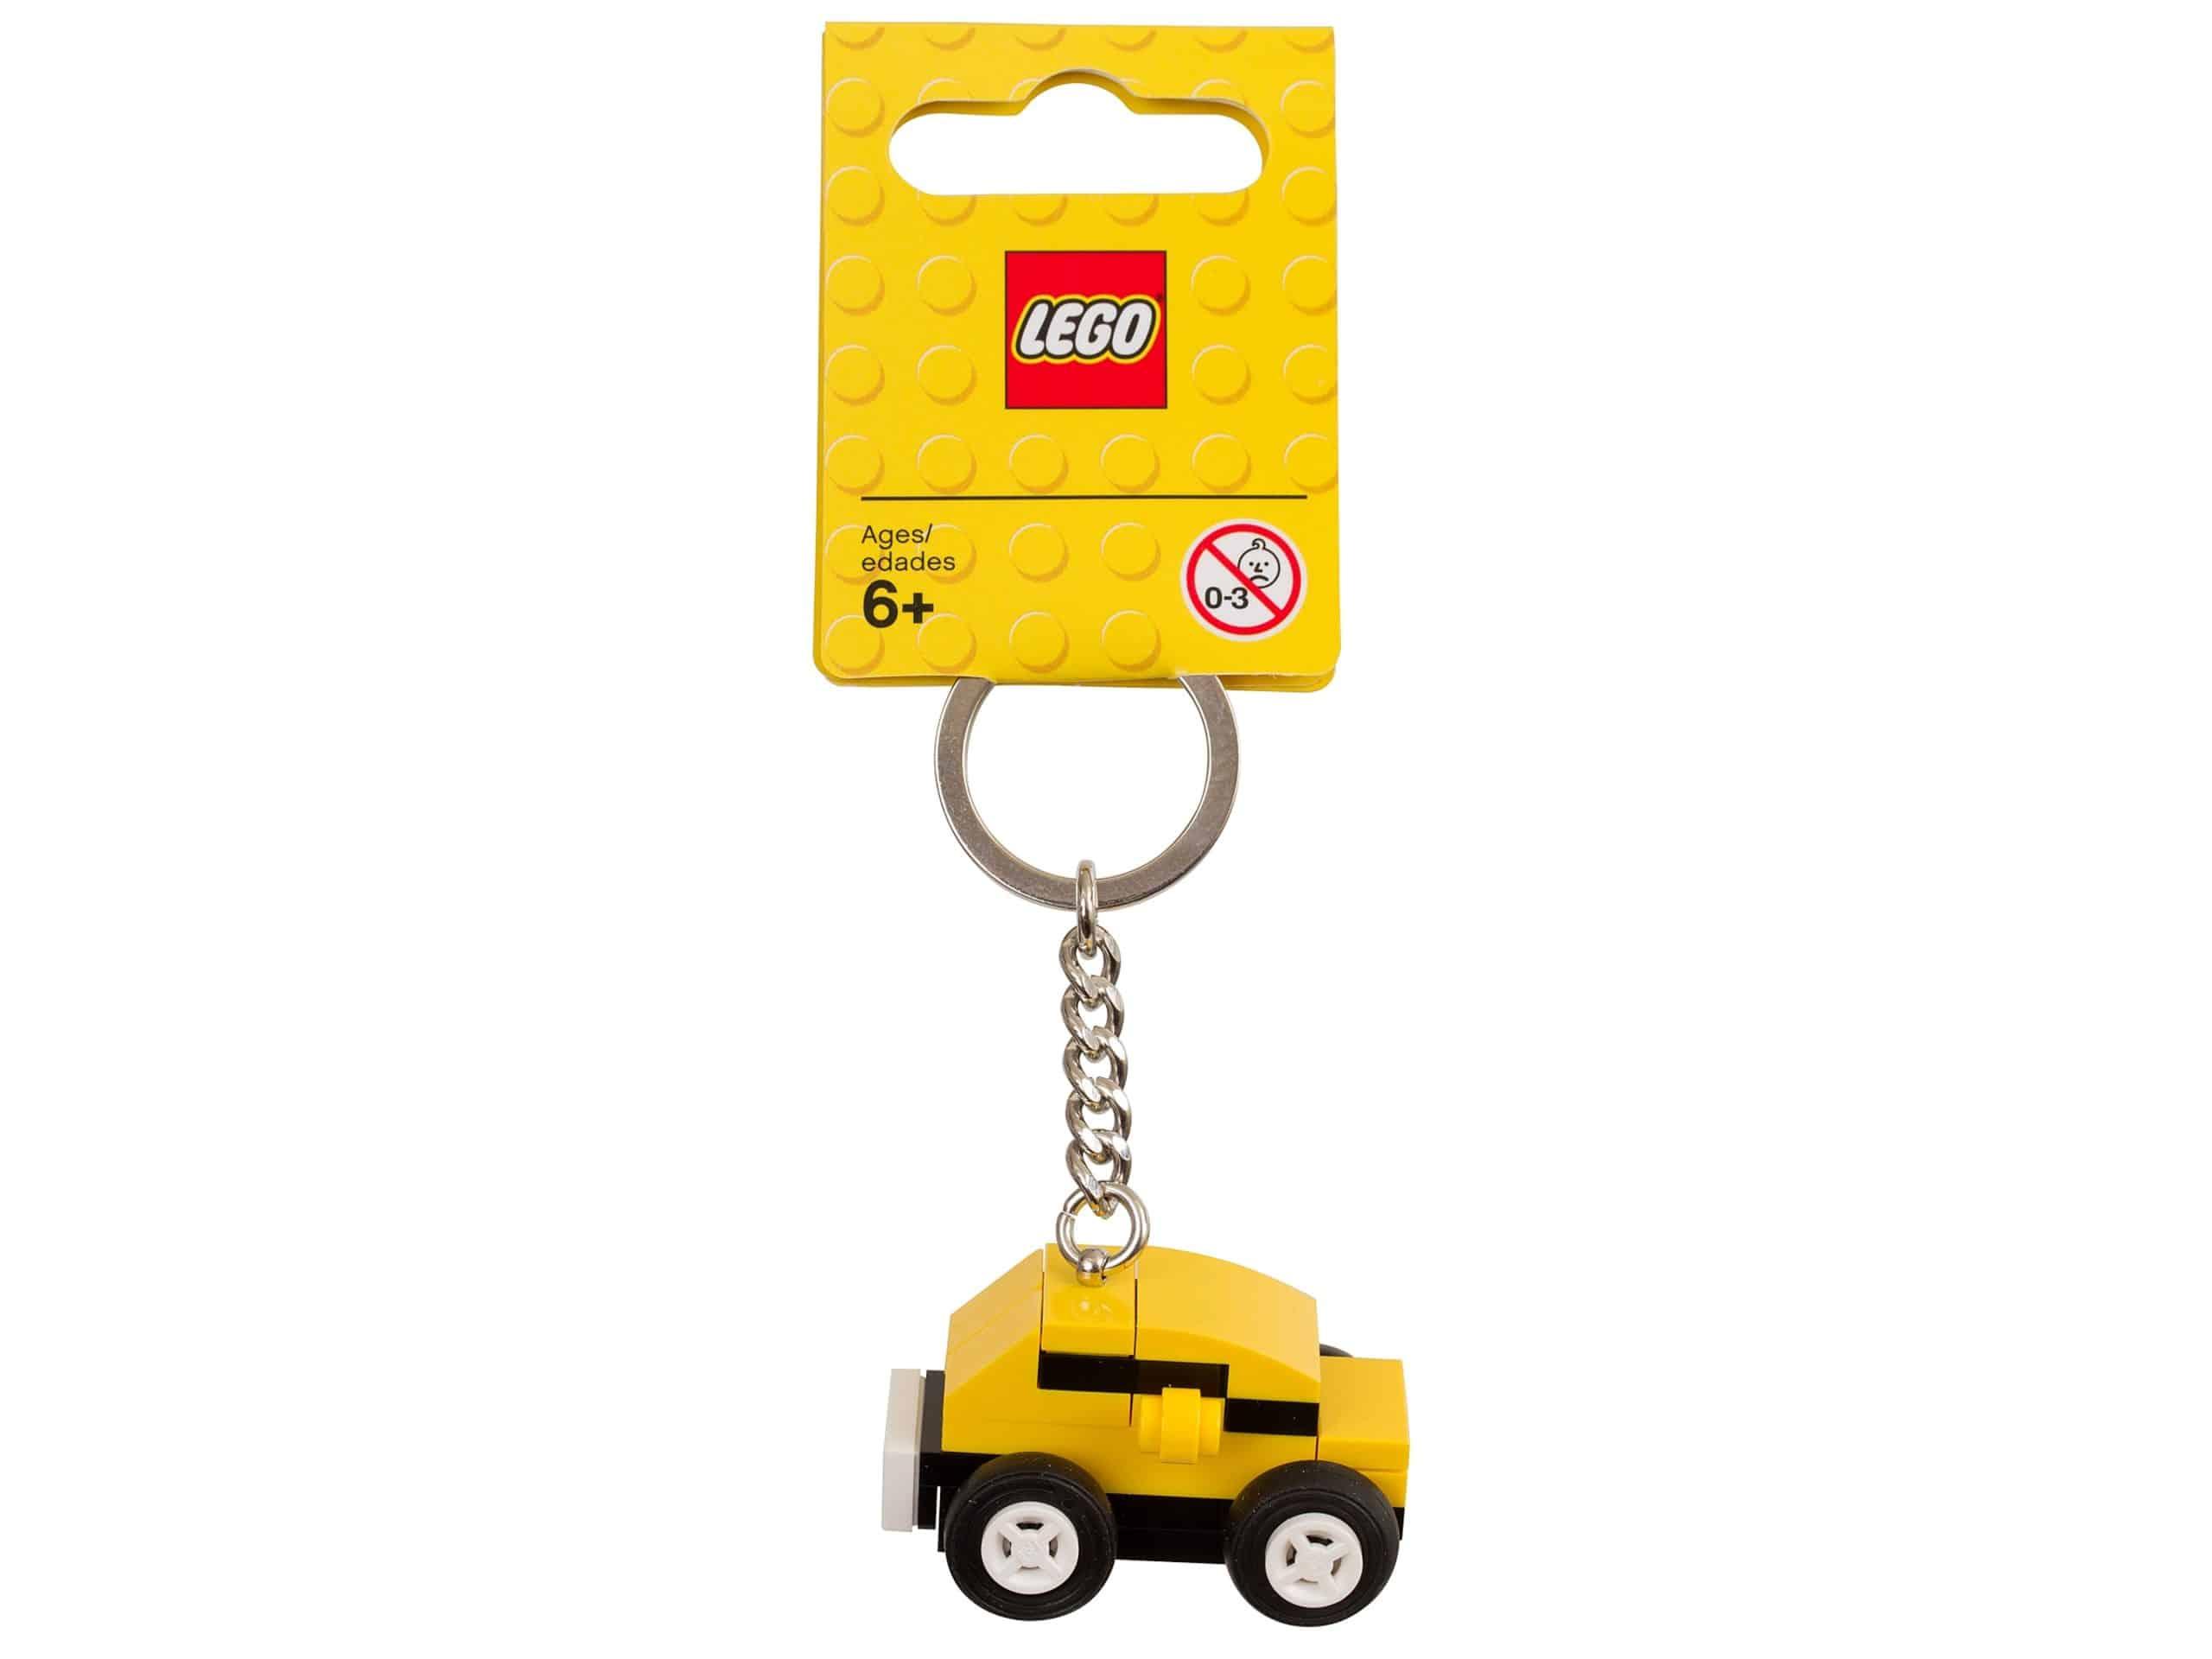 853573 official lego 853573 shop se scaled